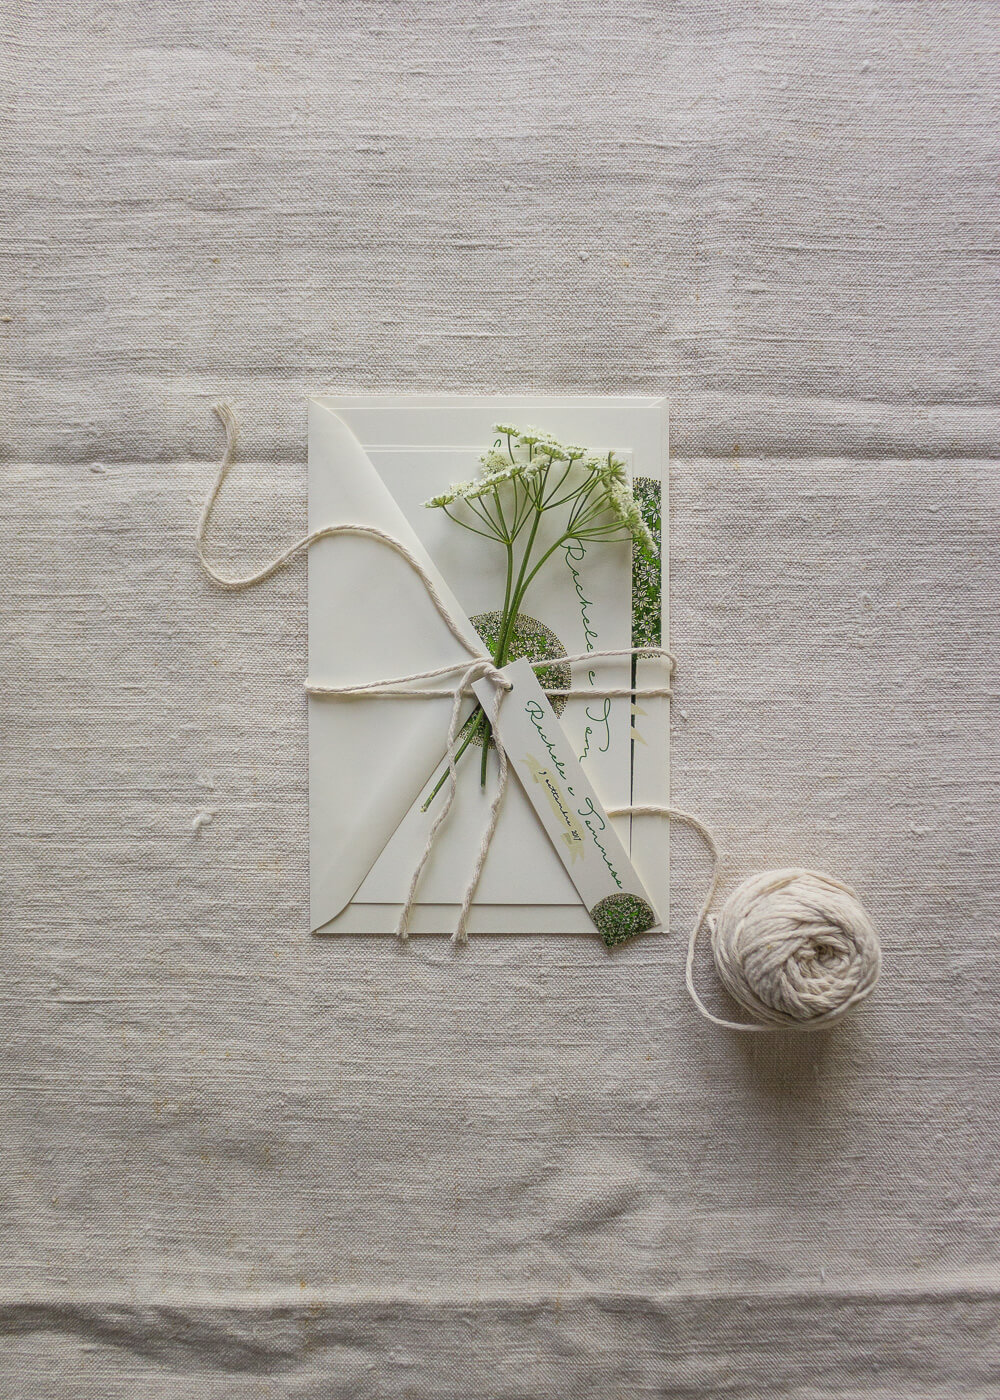 Wedding suite botanica Allium - Partecipazioni matrimonio e tag chiudi busta - Lily&Sage Design